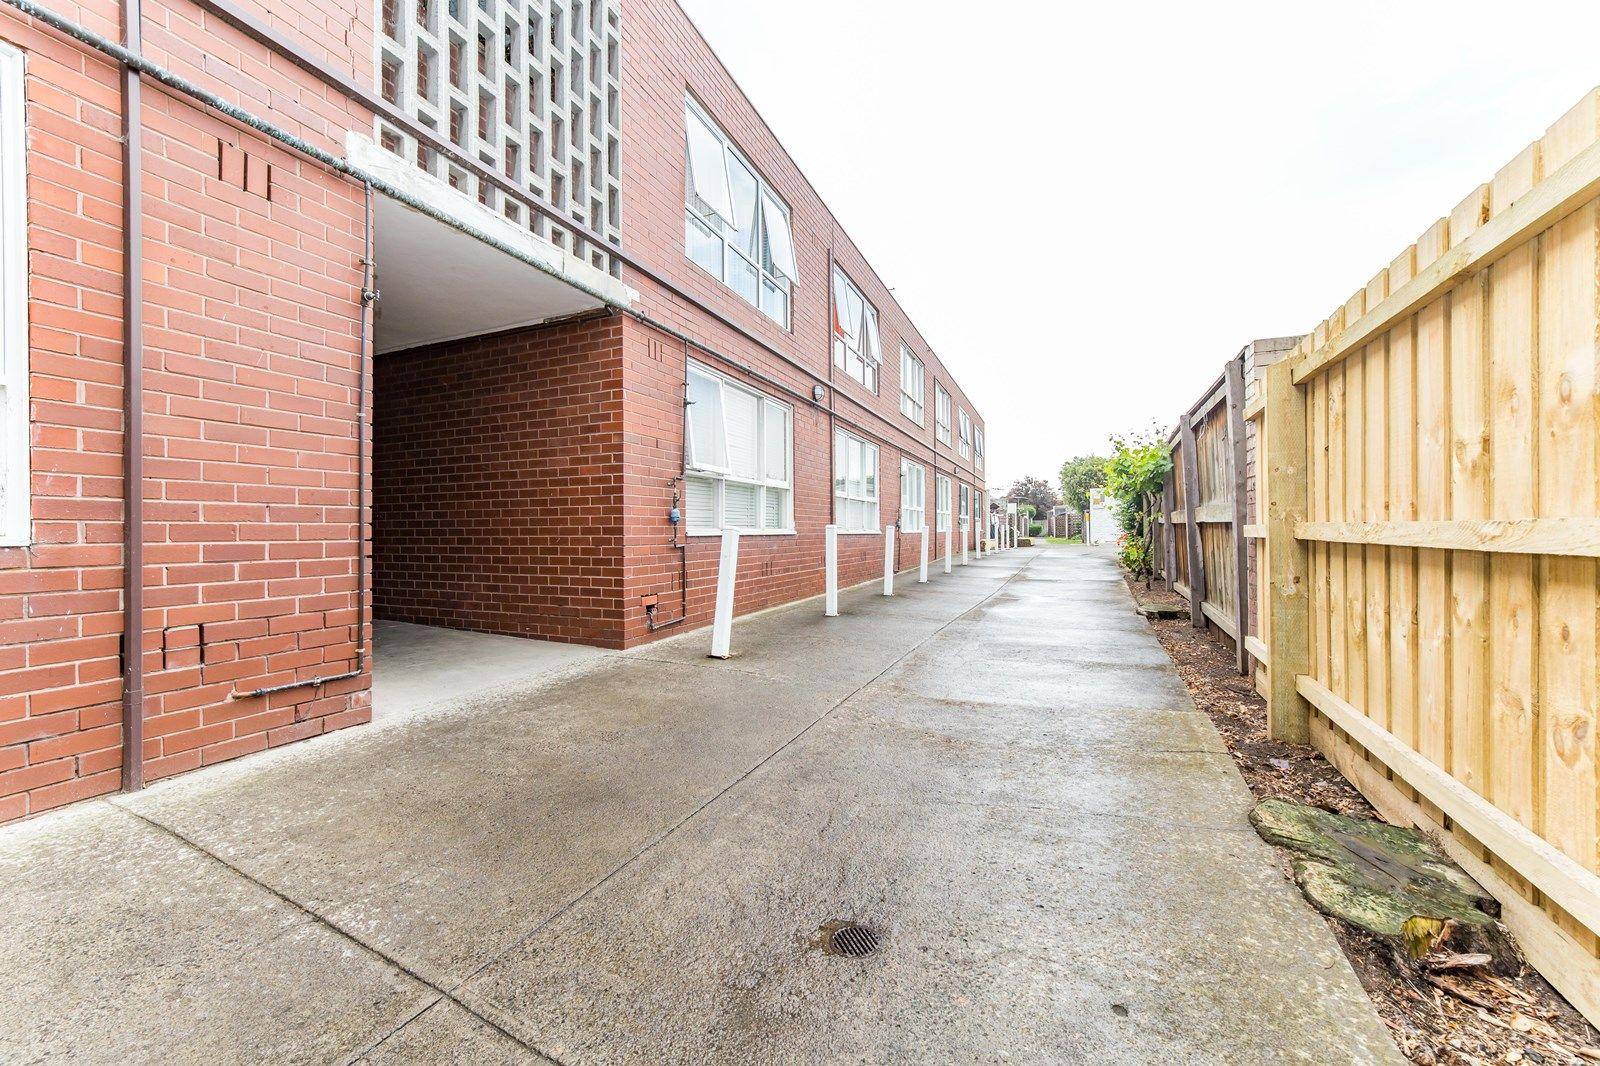 11/204 Ballarat Road, Footscray VIC 3011, Image 8